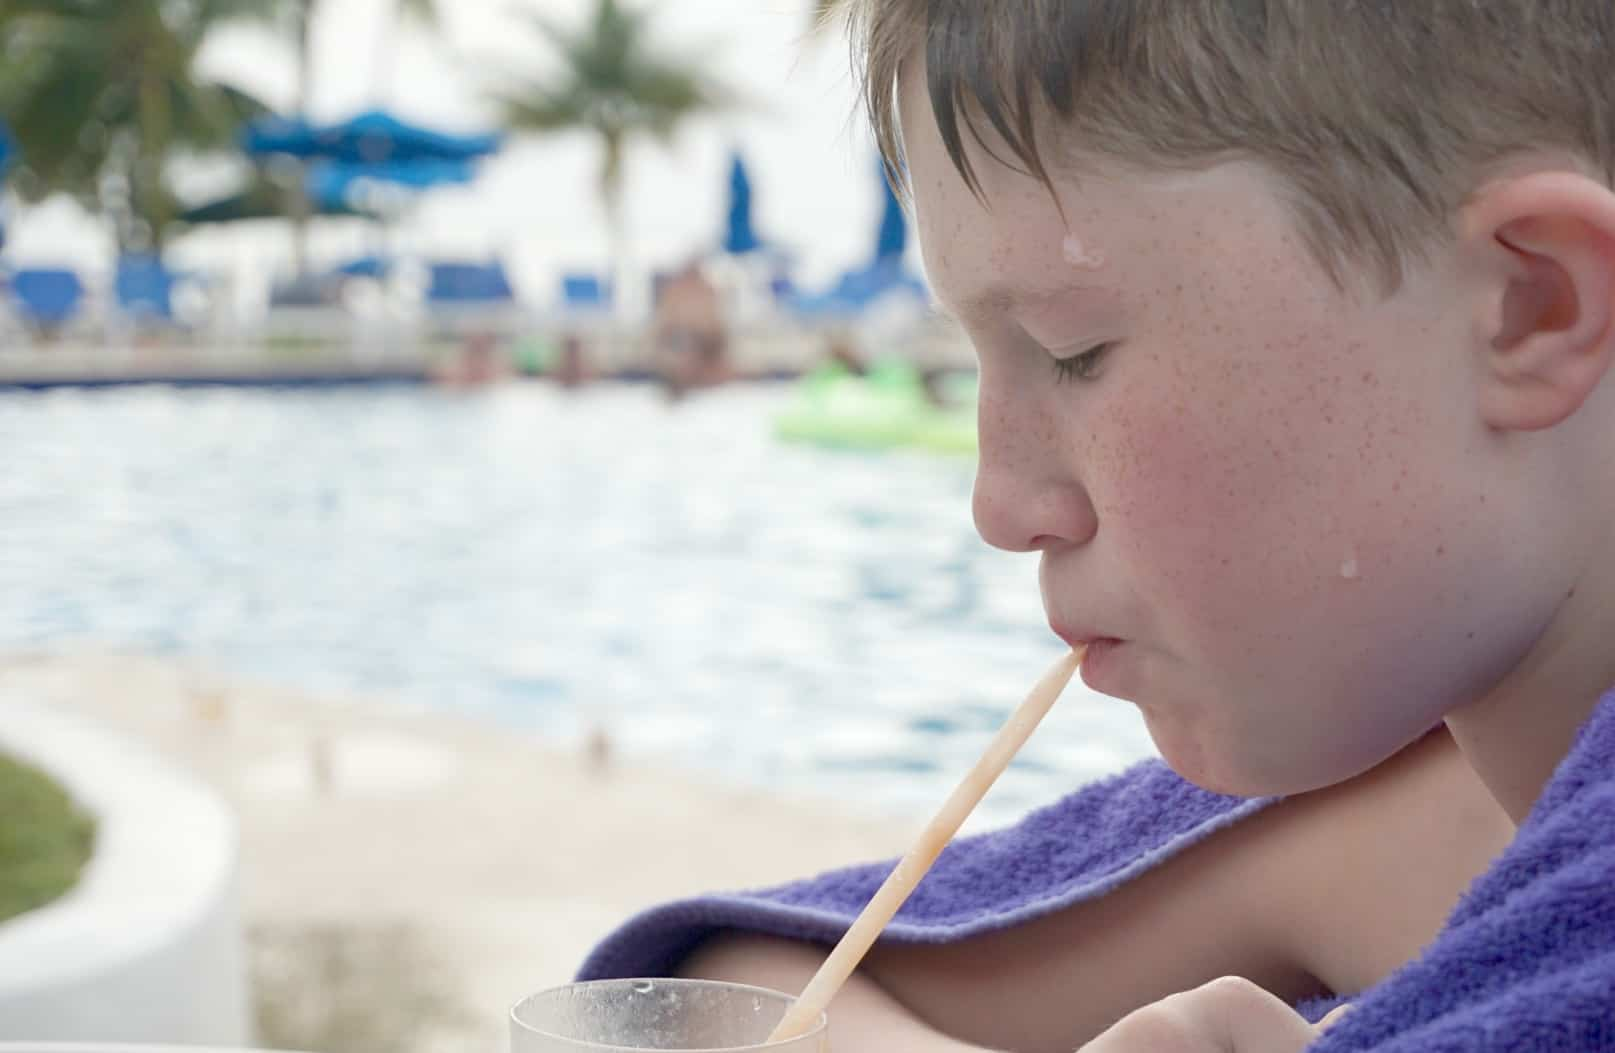 Drinking smoothies around the pool at Elite Island Resorts